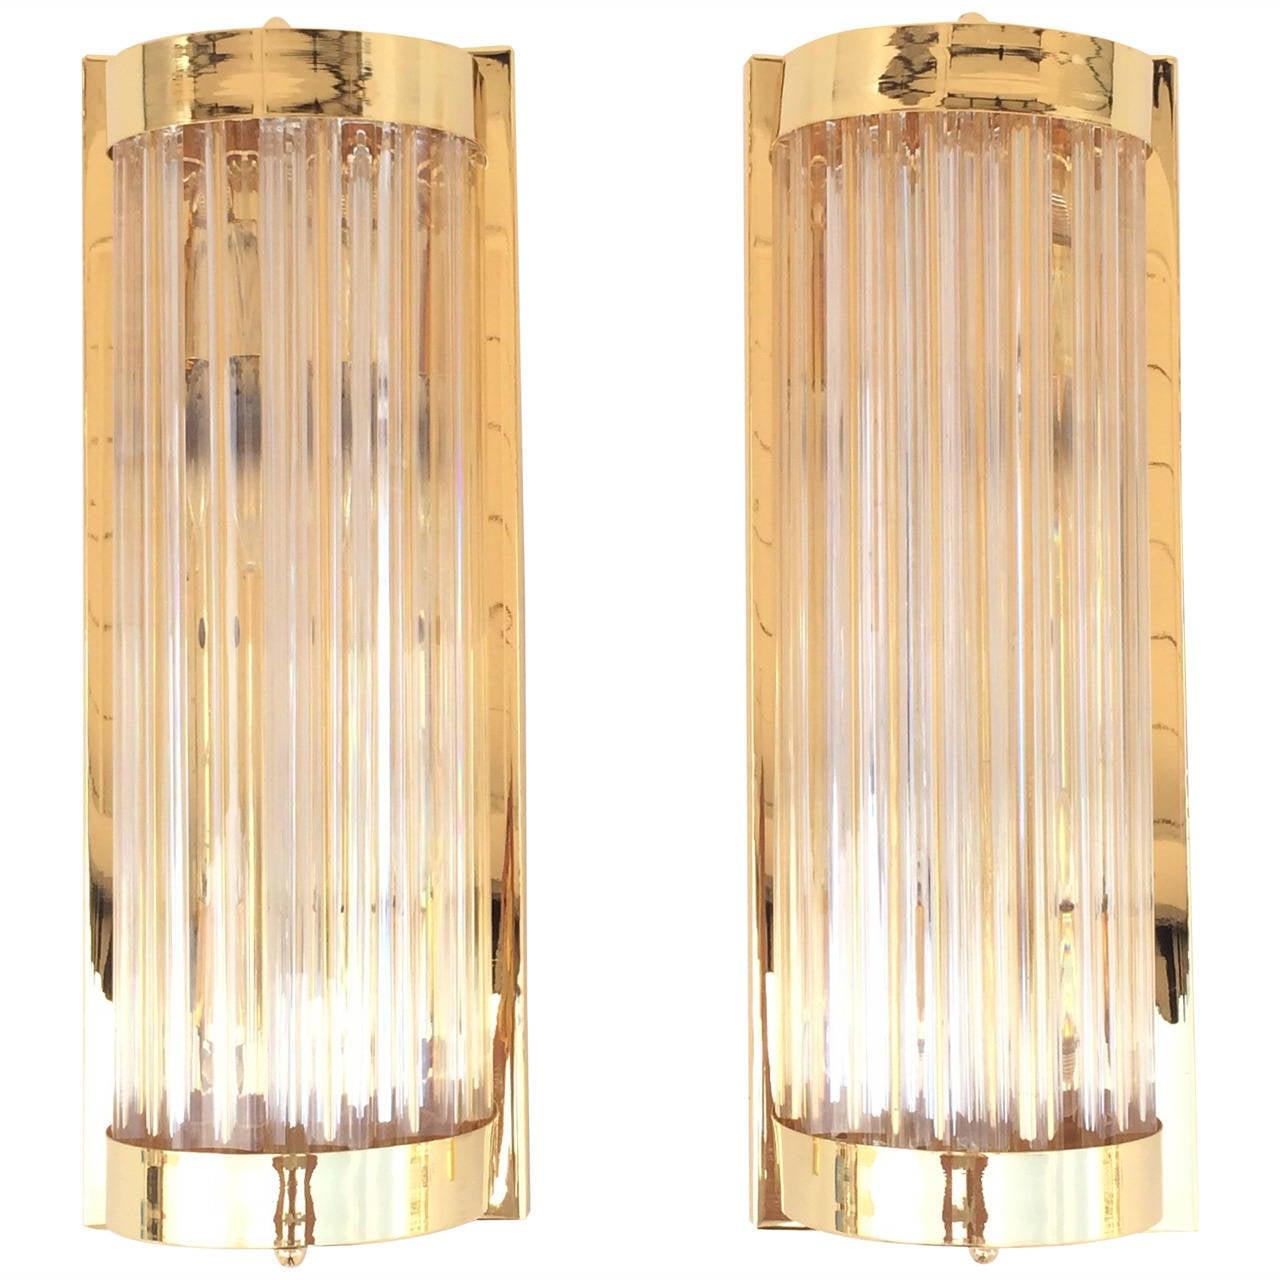 phenomenal polished brass with murano glass rods wall sconces by  - phenomenal polished brass with murano glass rods wall sconces by venini